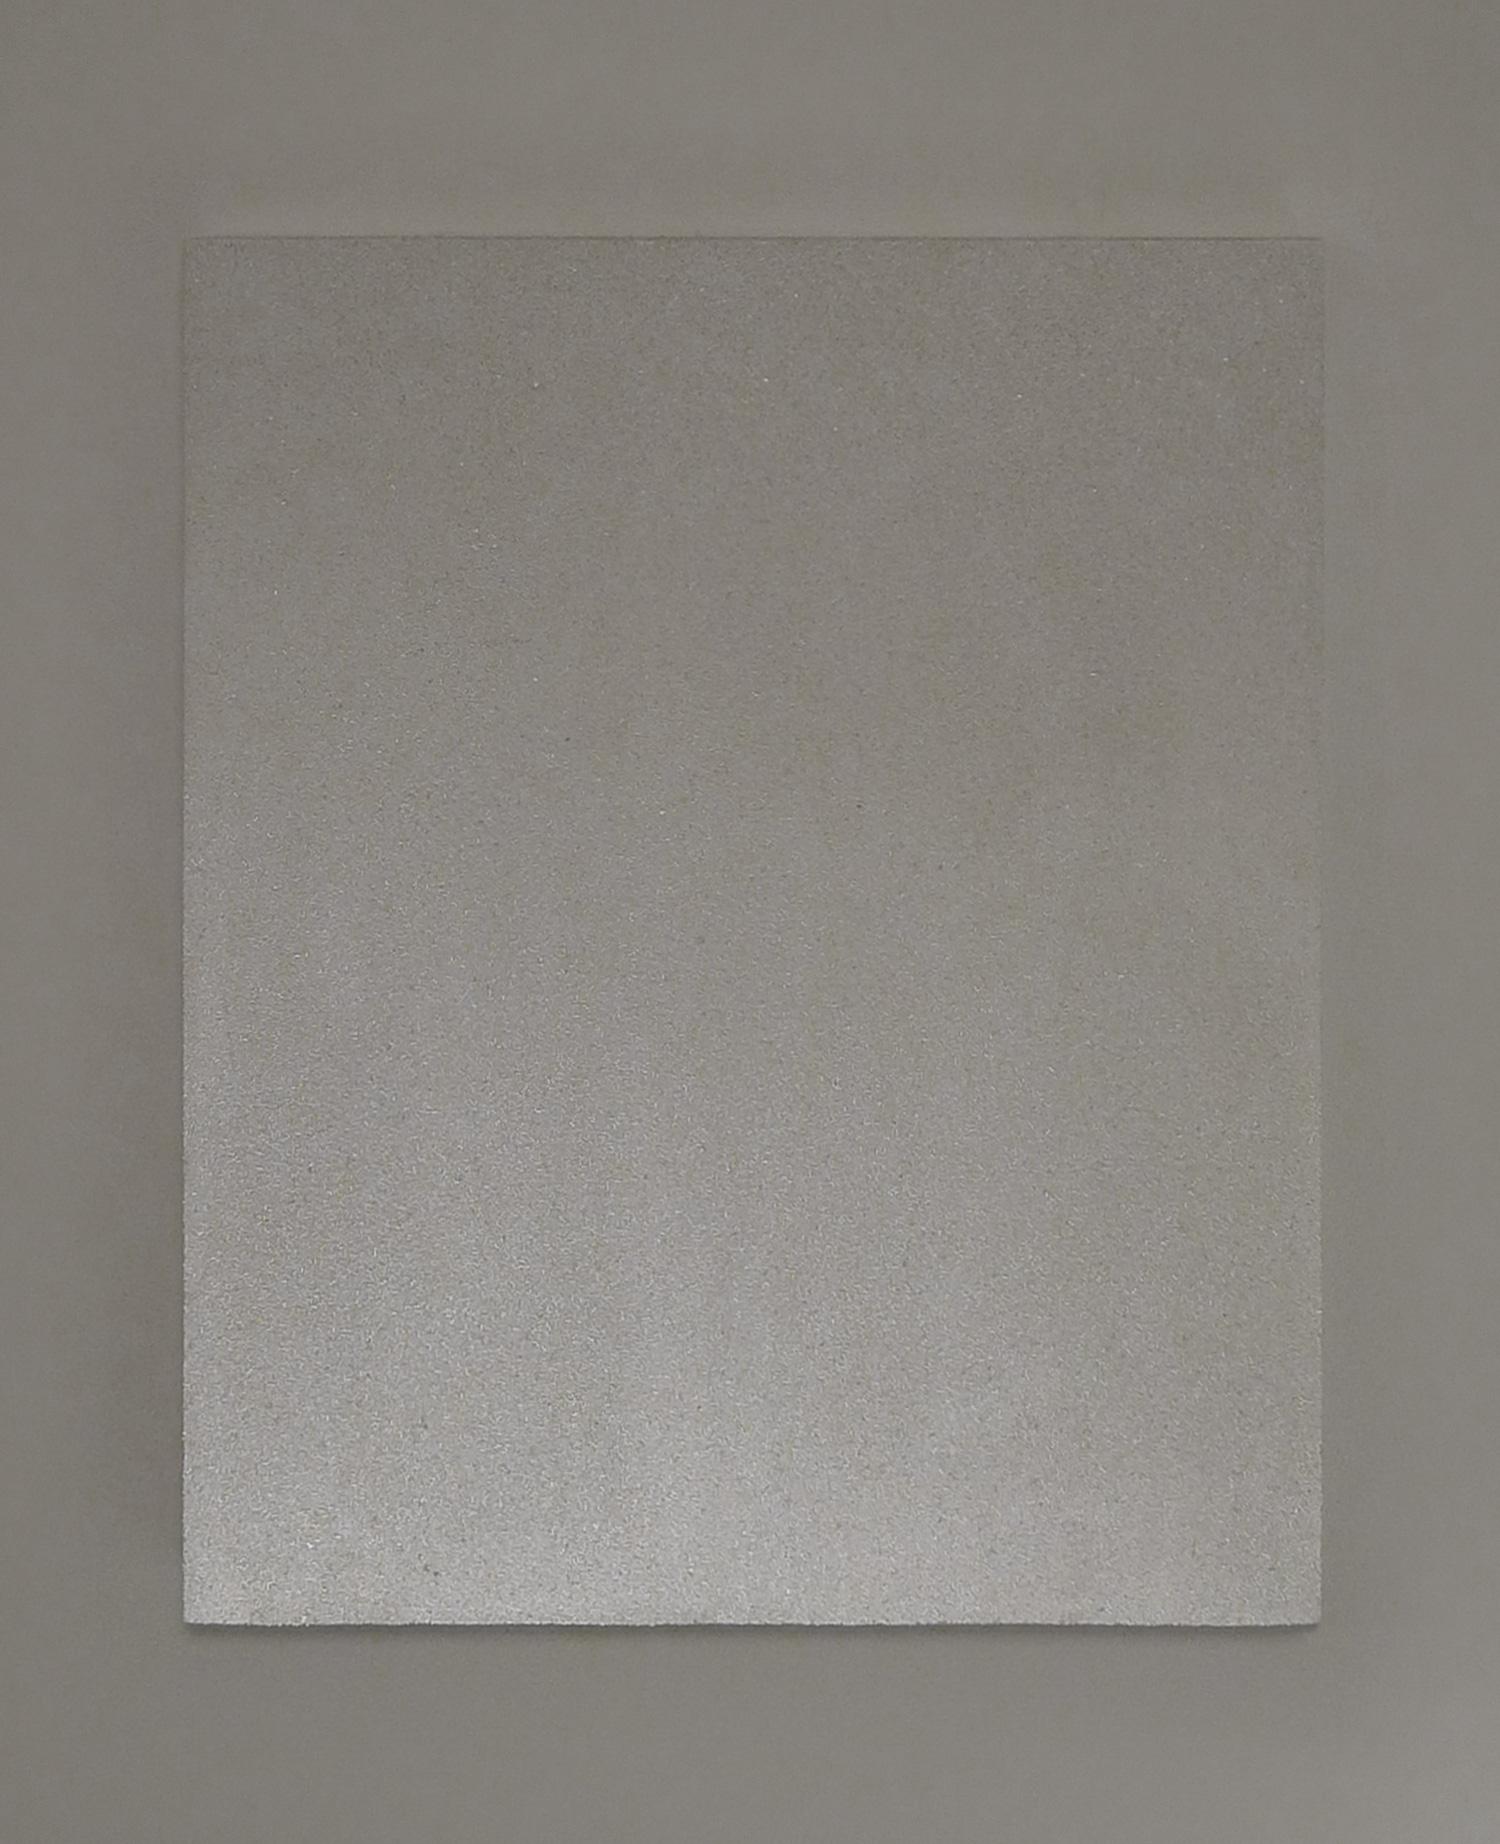 White-glass-painting-1-Buckley-72dpi-1500px-web.jpg